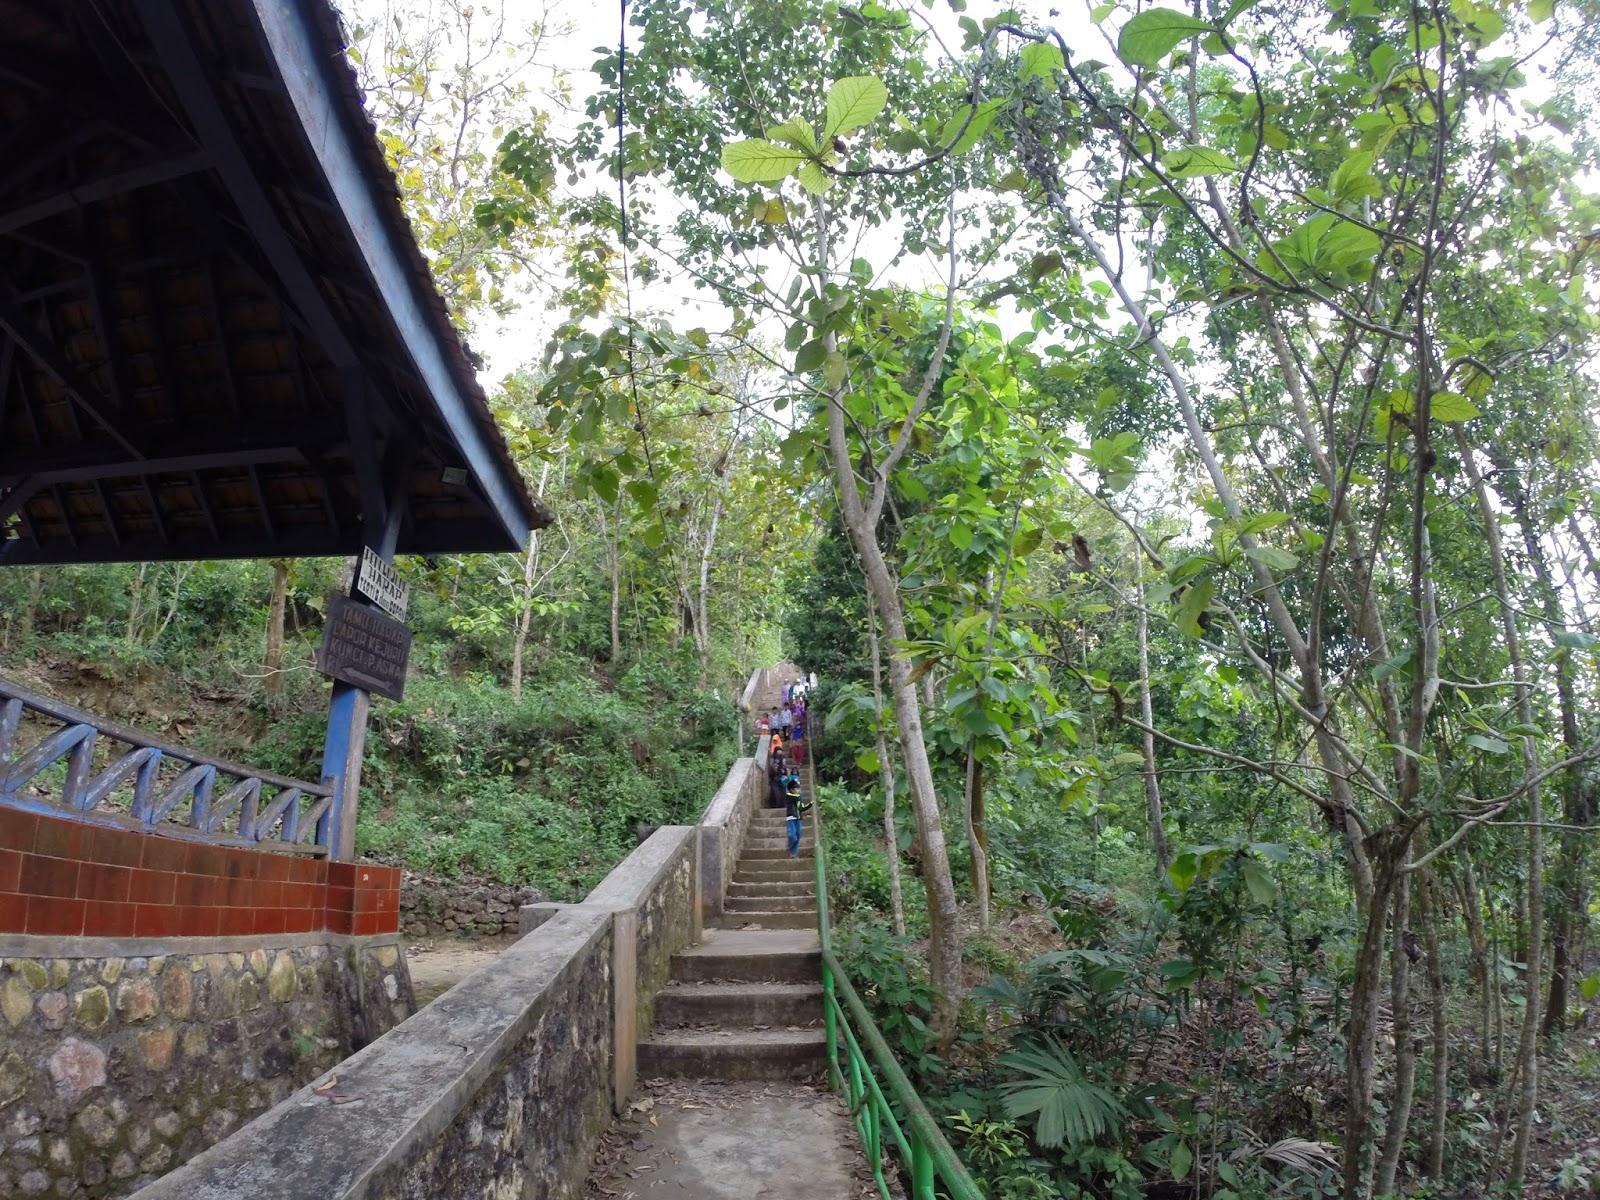 Wisata Alam Kabupaten Bangkalan Panduan Surabaya Pesona 1 Bukit Geger